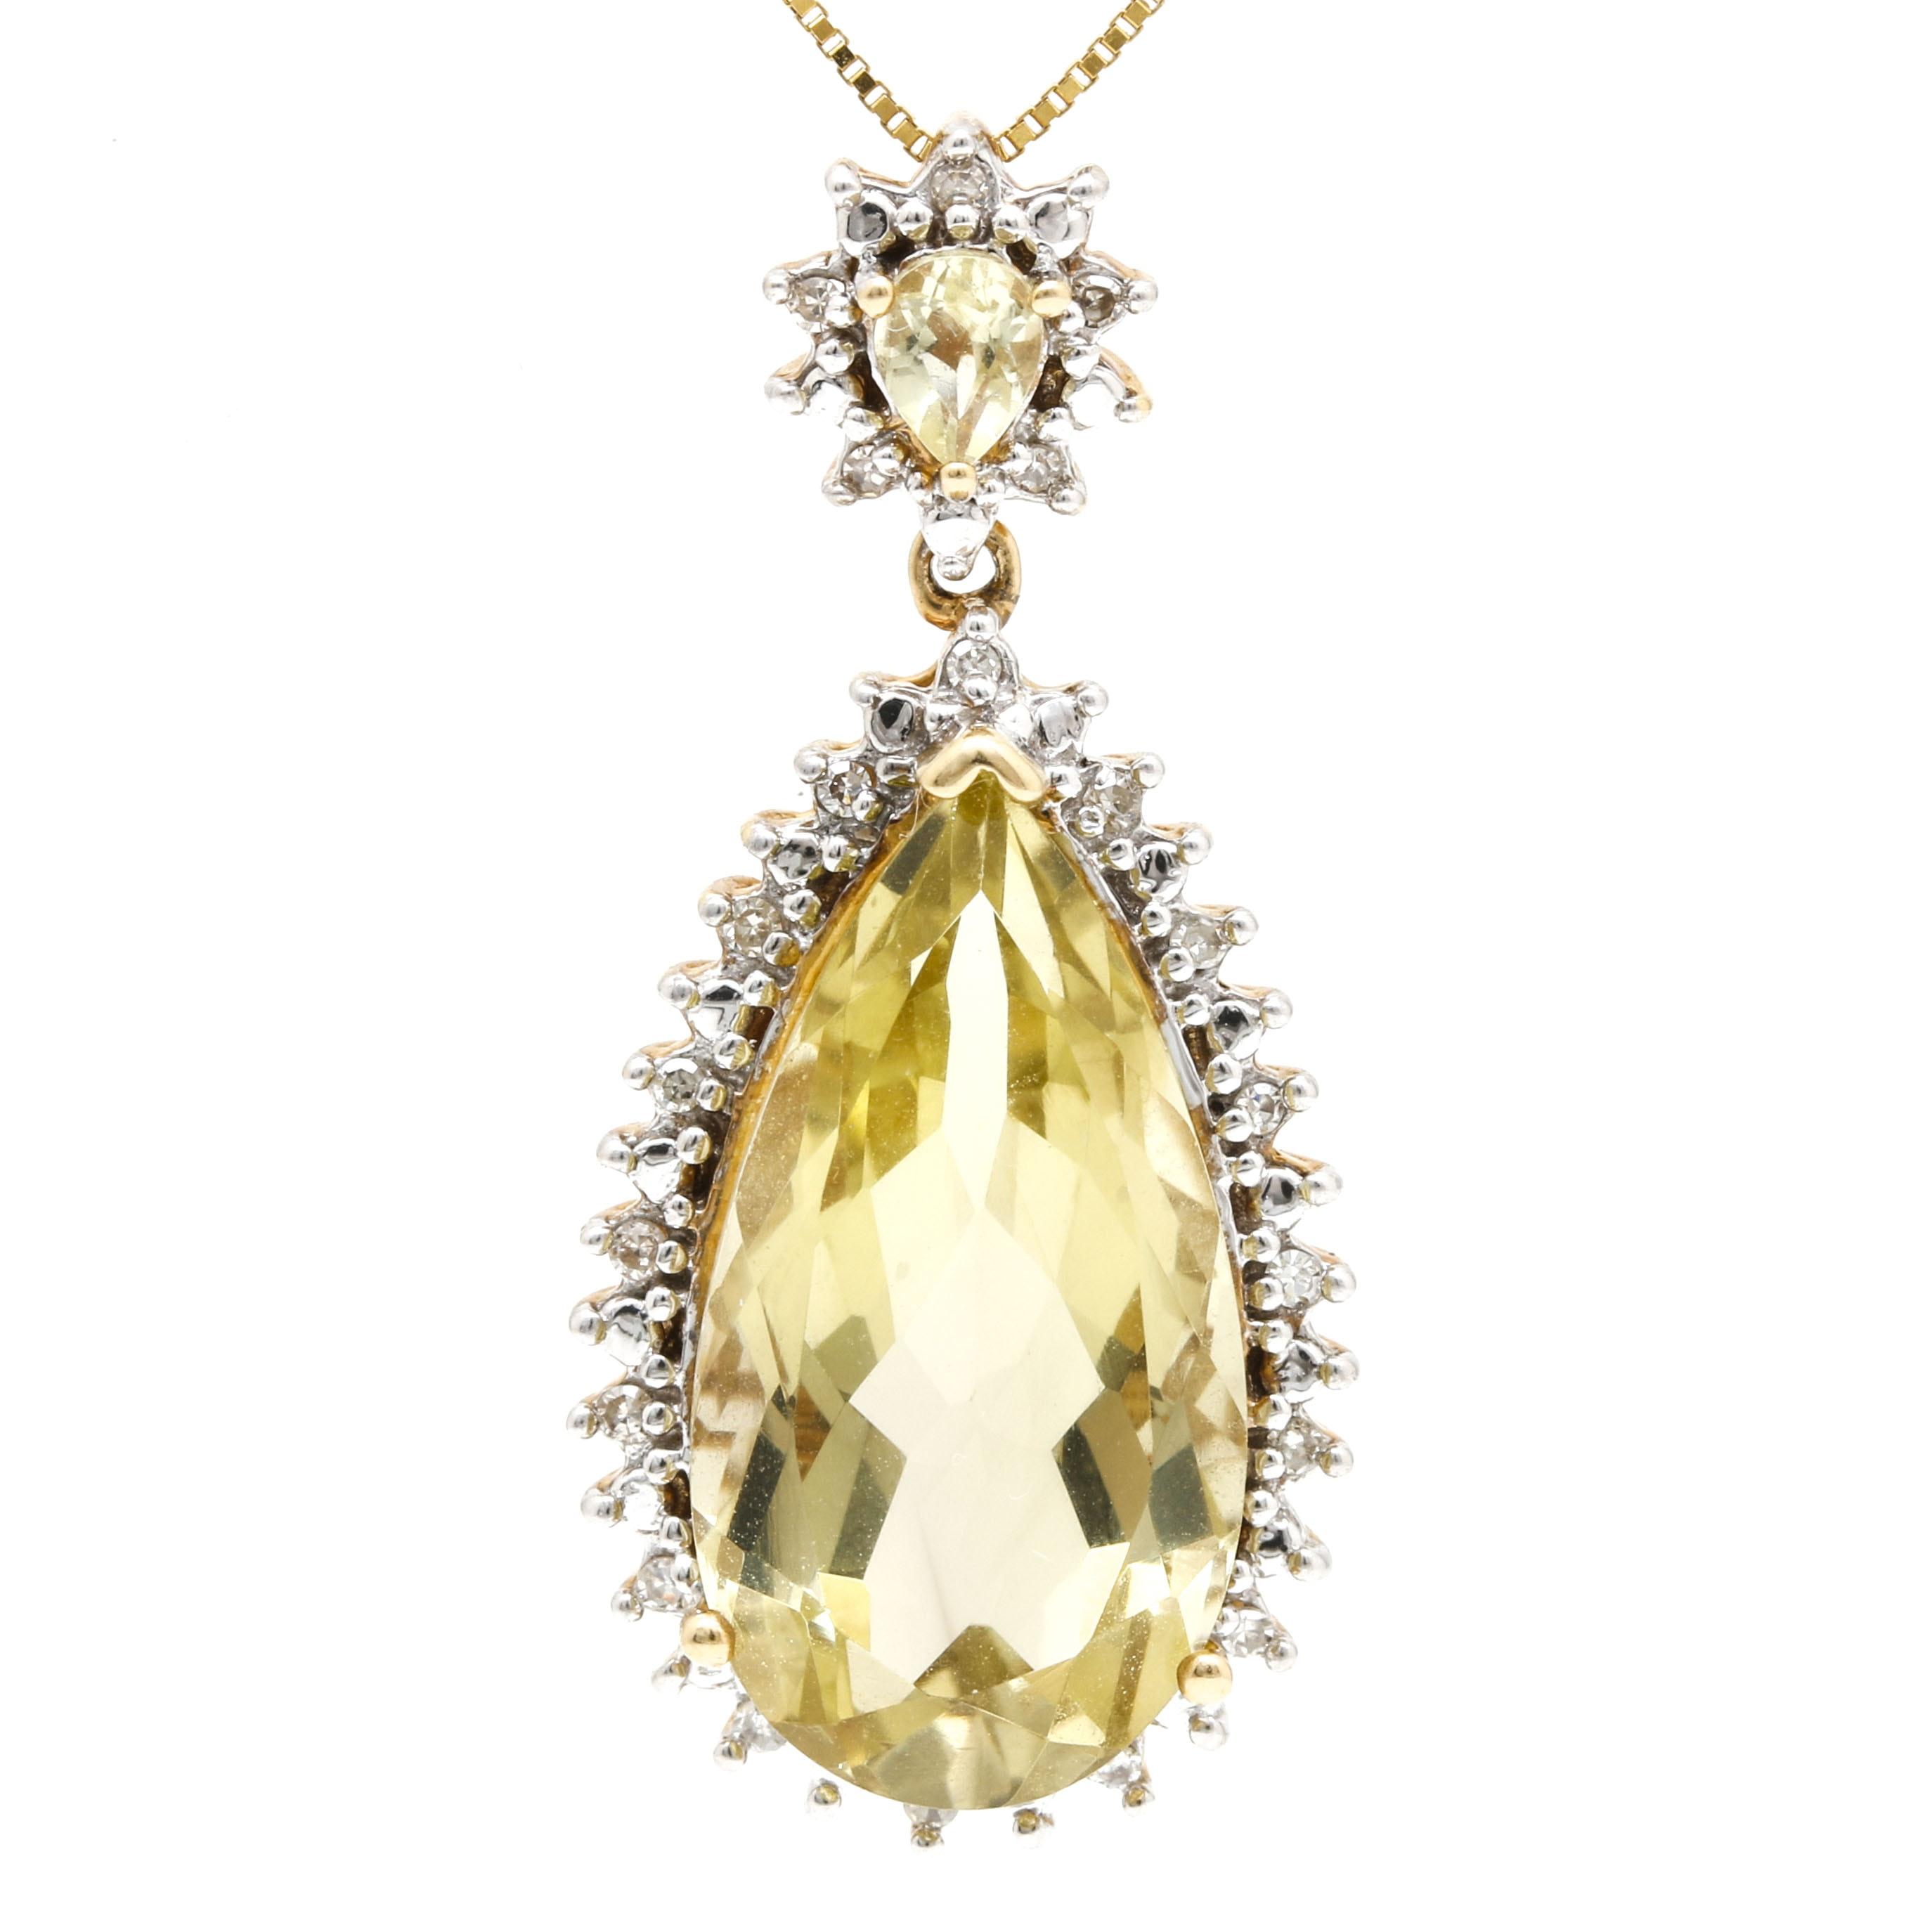 Clyde Duneier 14K Yellow Gold Lime Quartz and Diamond Pendant Necklace